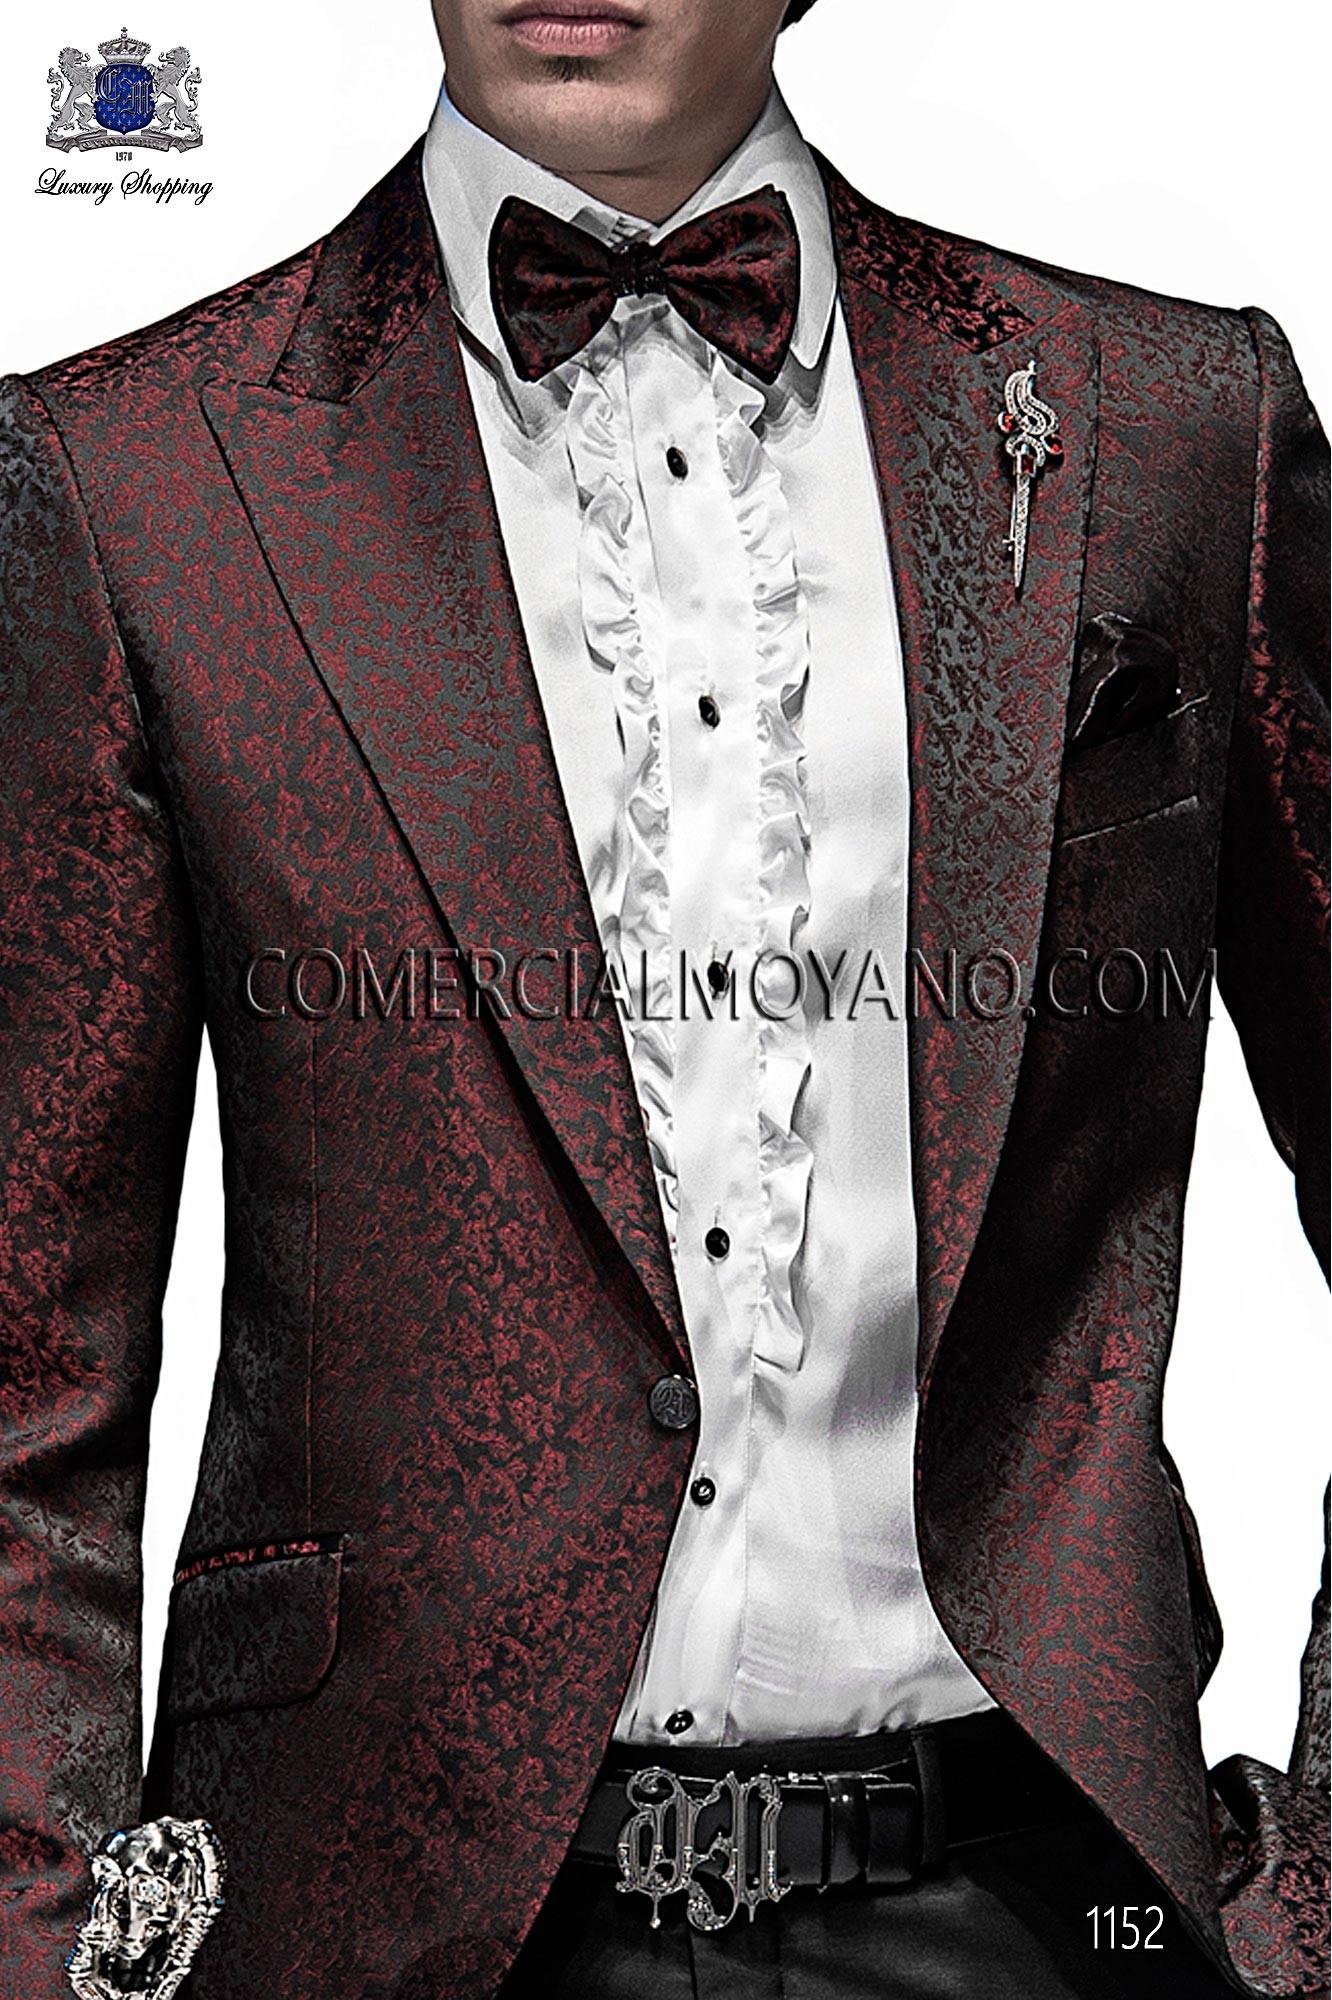 Italian emotion black/red men wedding suit, model: 1152 Ottavio Nuccio Gala 2017 Emotion Collection